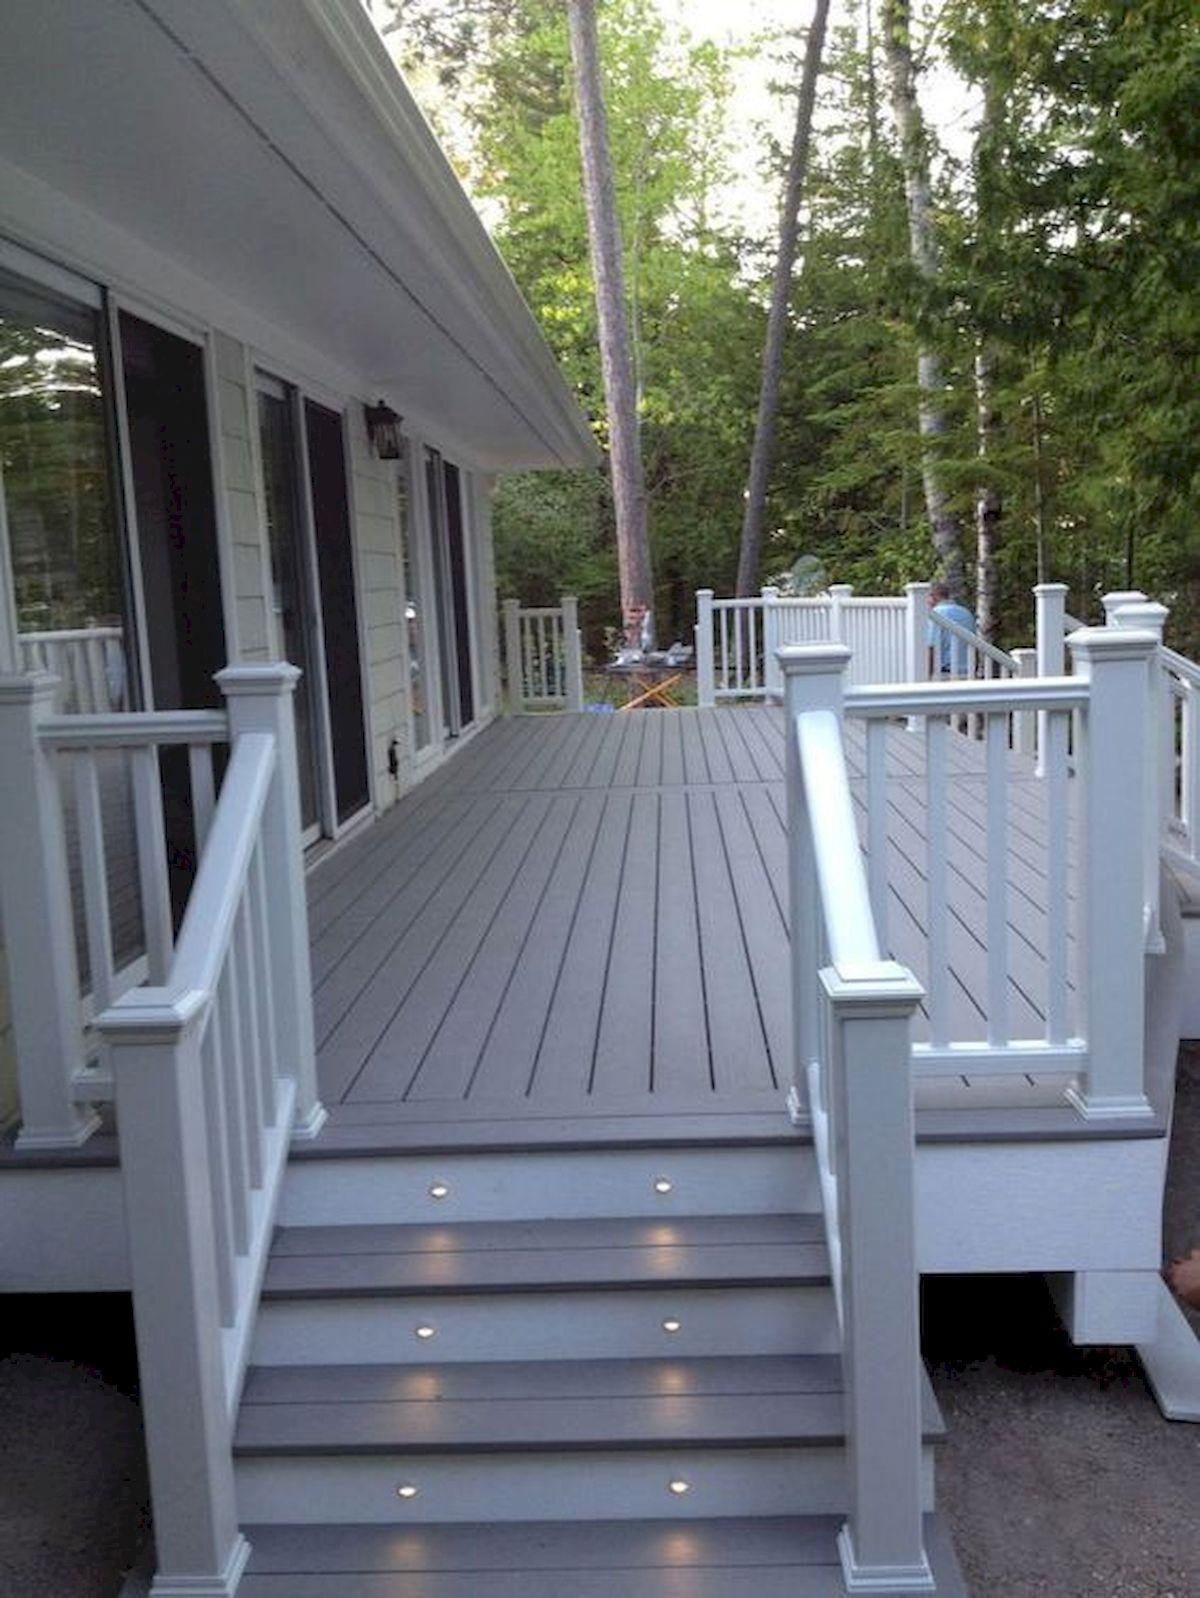 50 Best DIY Backyard Patio and Decking Design Ideas (30)